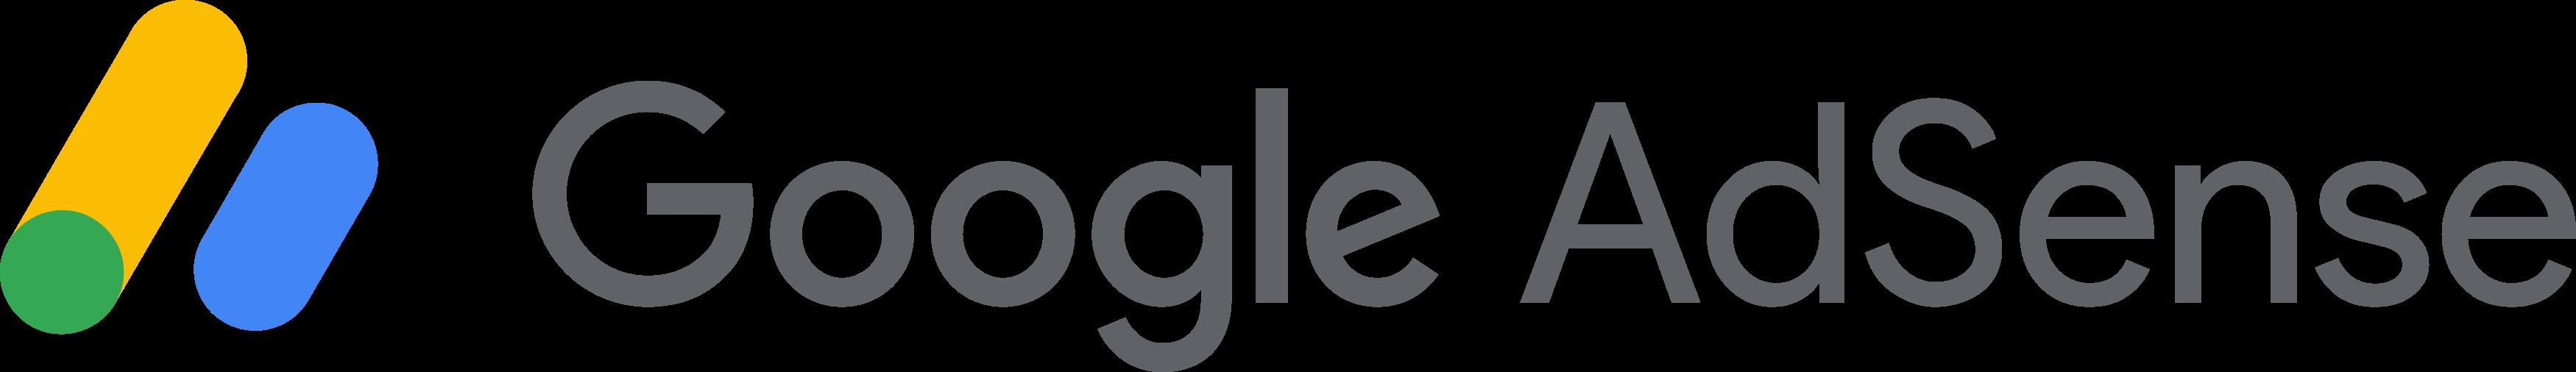 Google Adsense Logo.